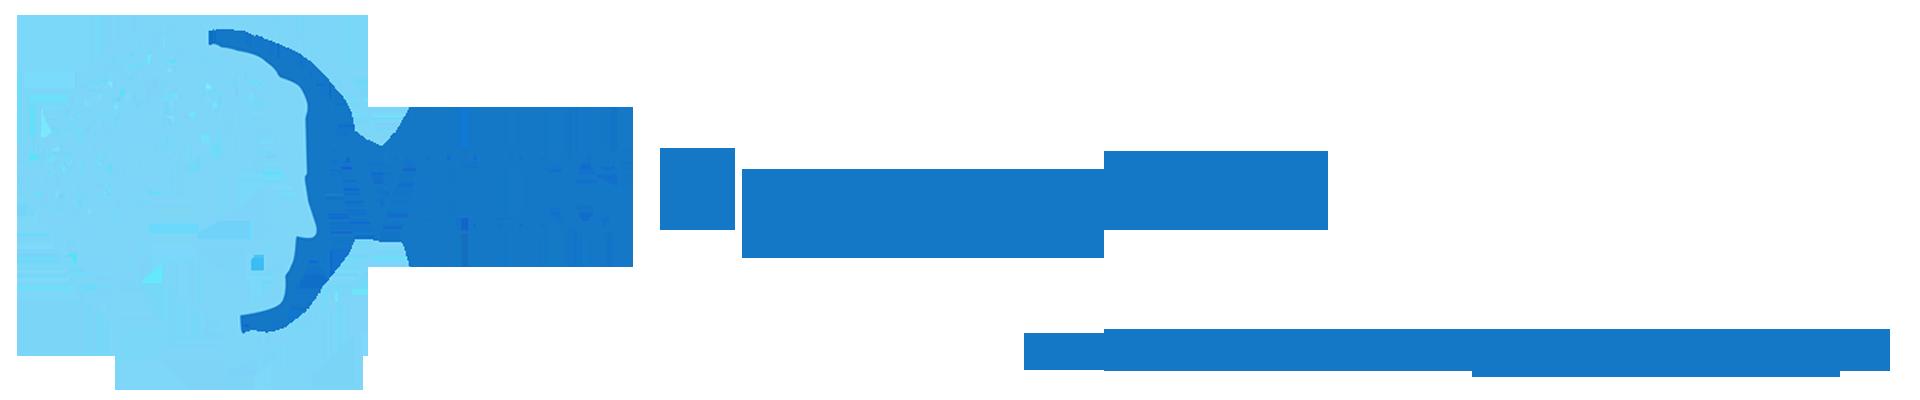 VHIG Beurs 2021